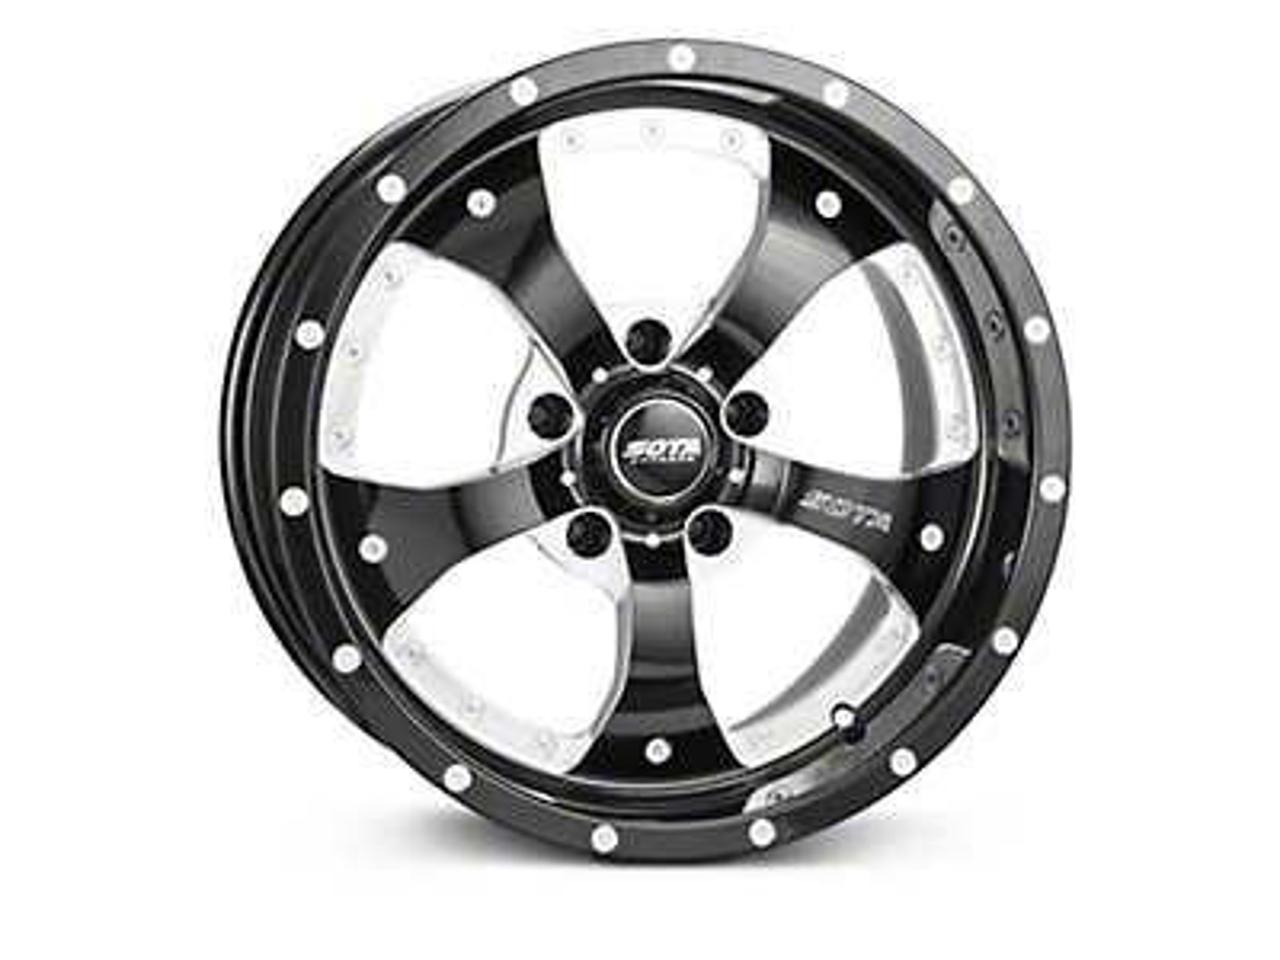 SOTA Off Road Novakane Death Metal Wheels (07-18 Wrangler JK; 2018 Wrangler JL)